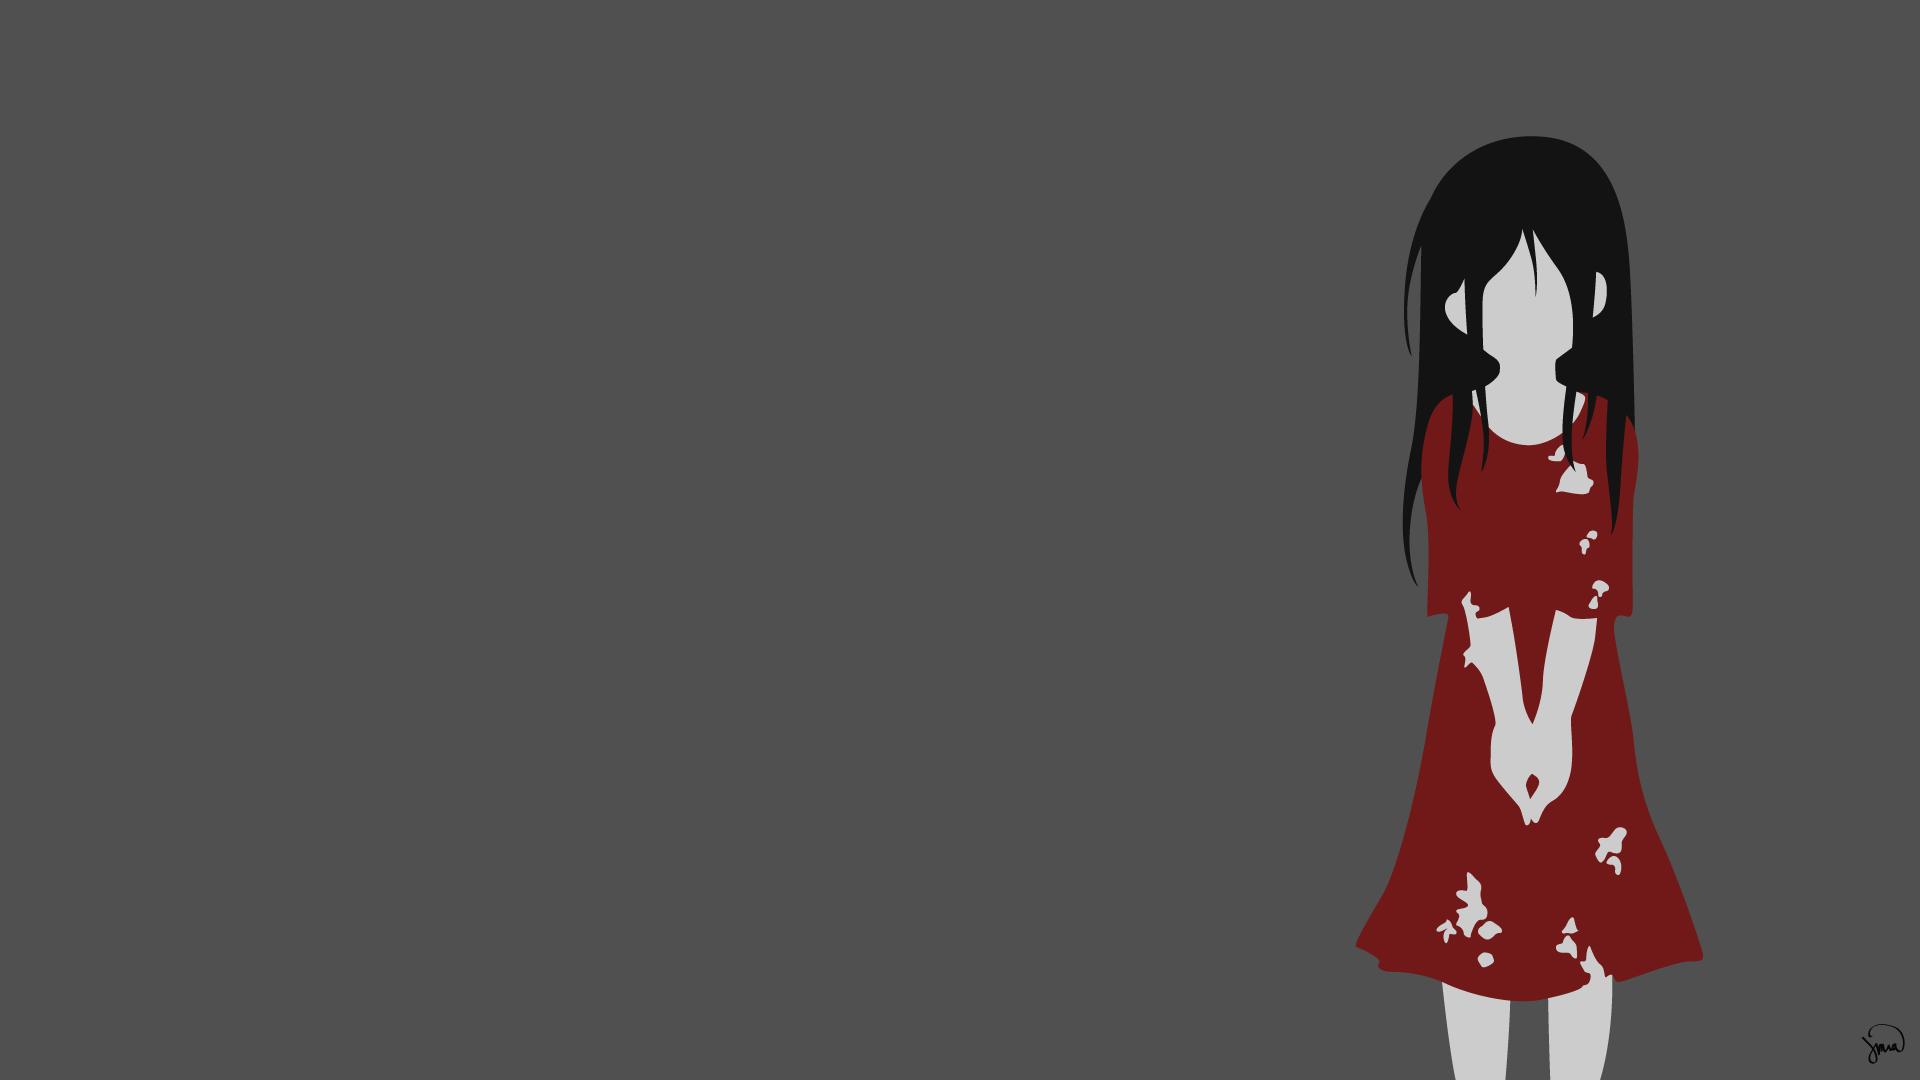 Anime 1920x1080 anime girls Corpse Party horror anime vector anime vectors